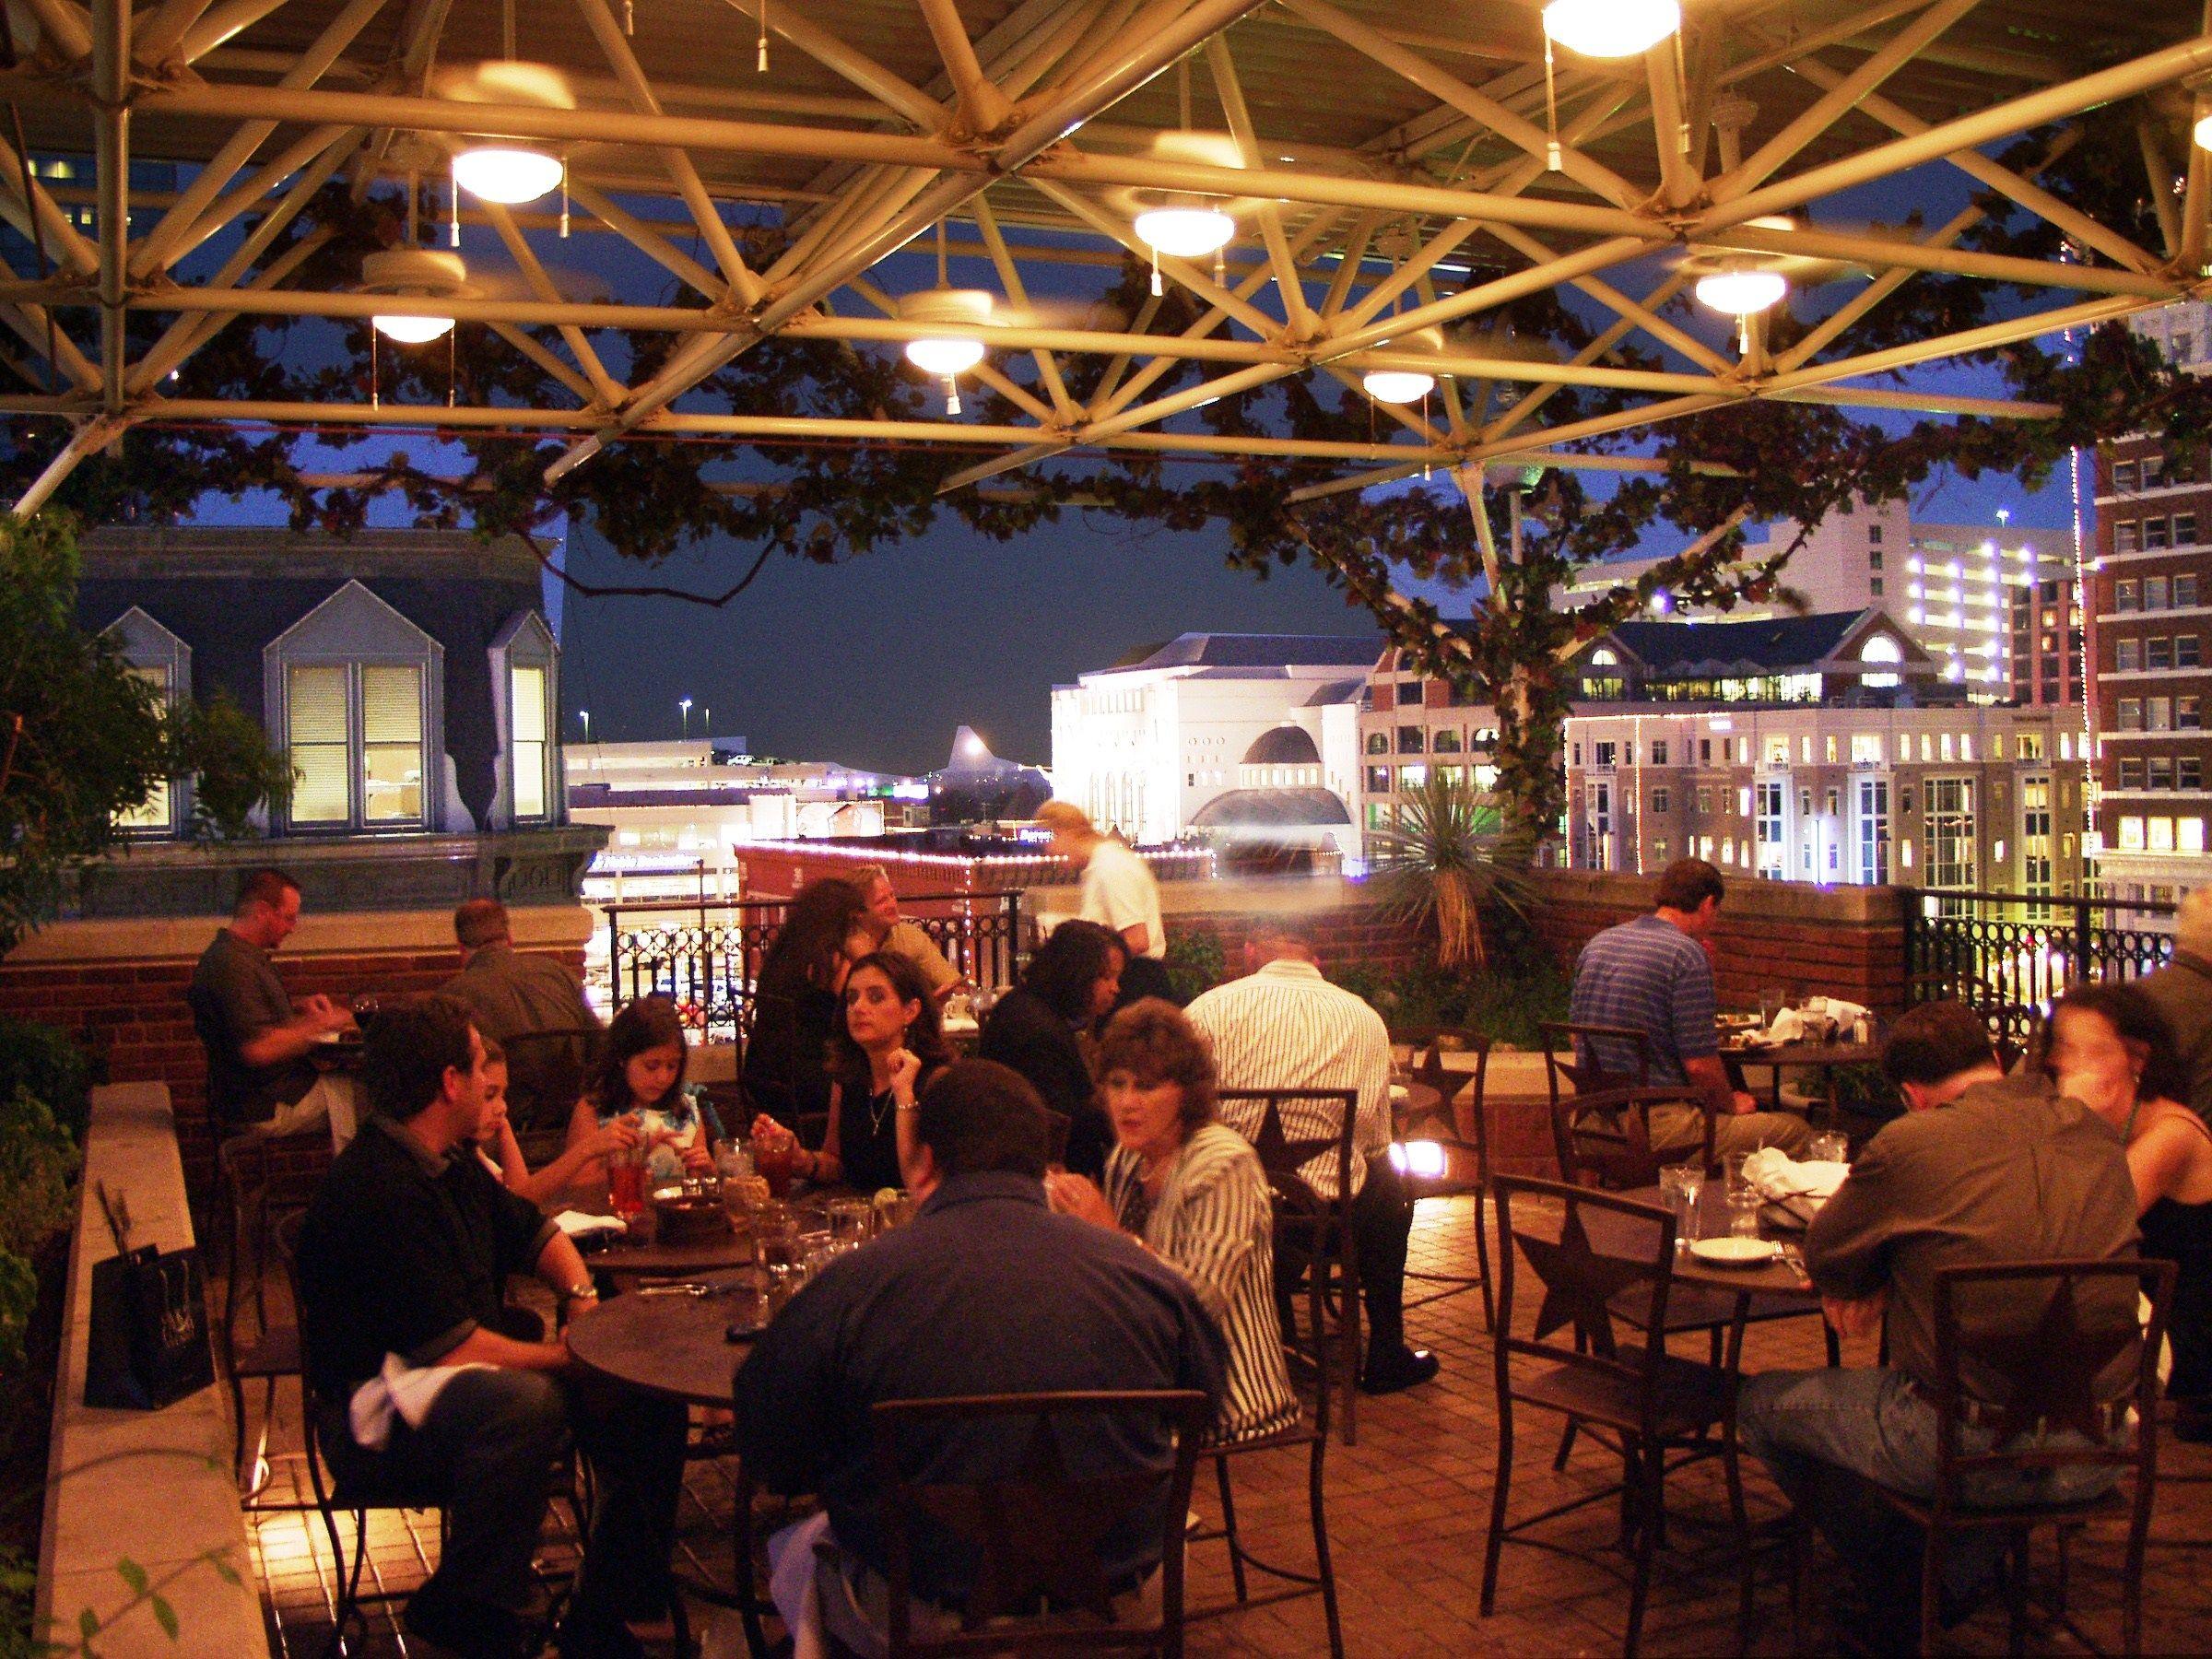 @ReataRestaurant Patio #Big12Top12 Patios #DiscoverFW #FortWorth